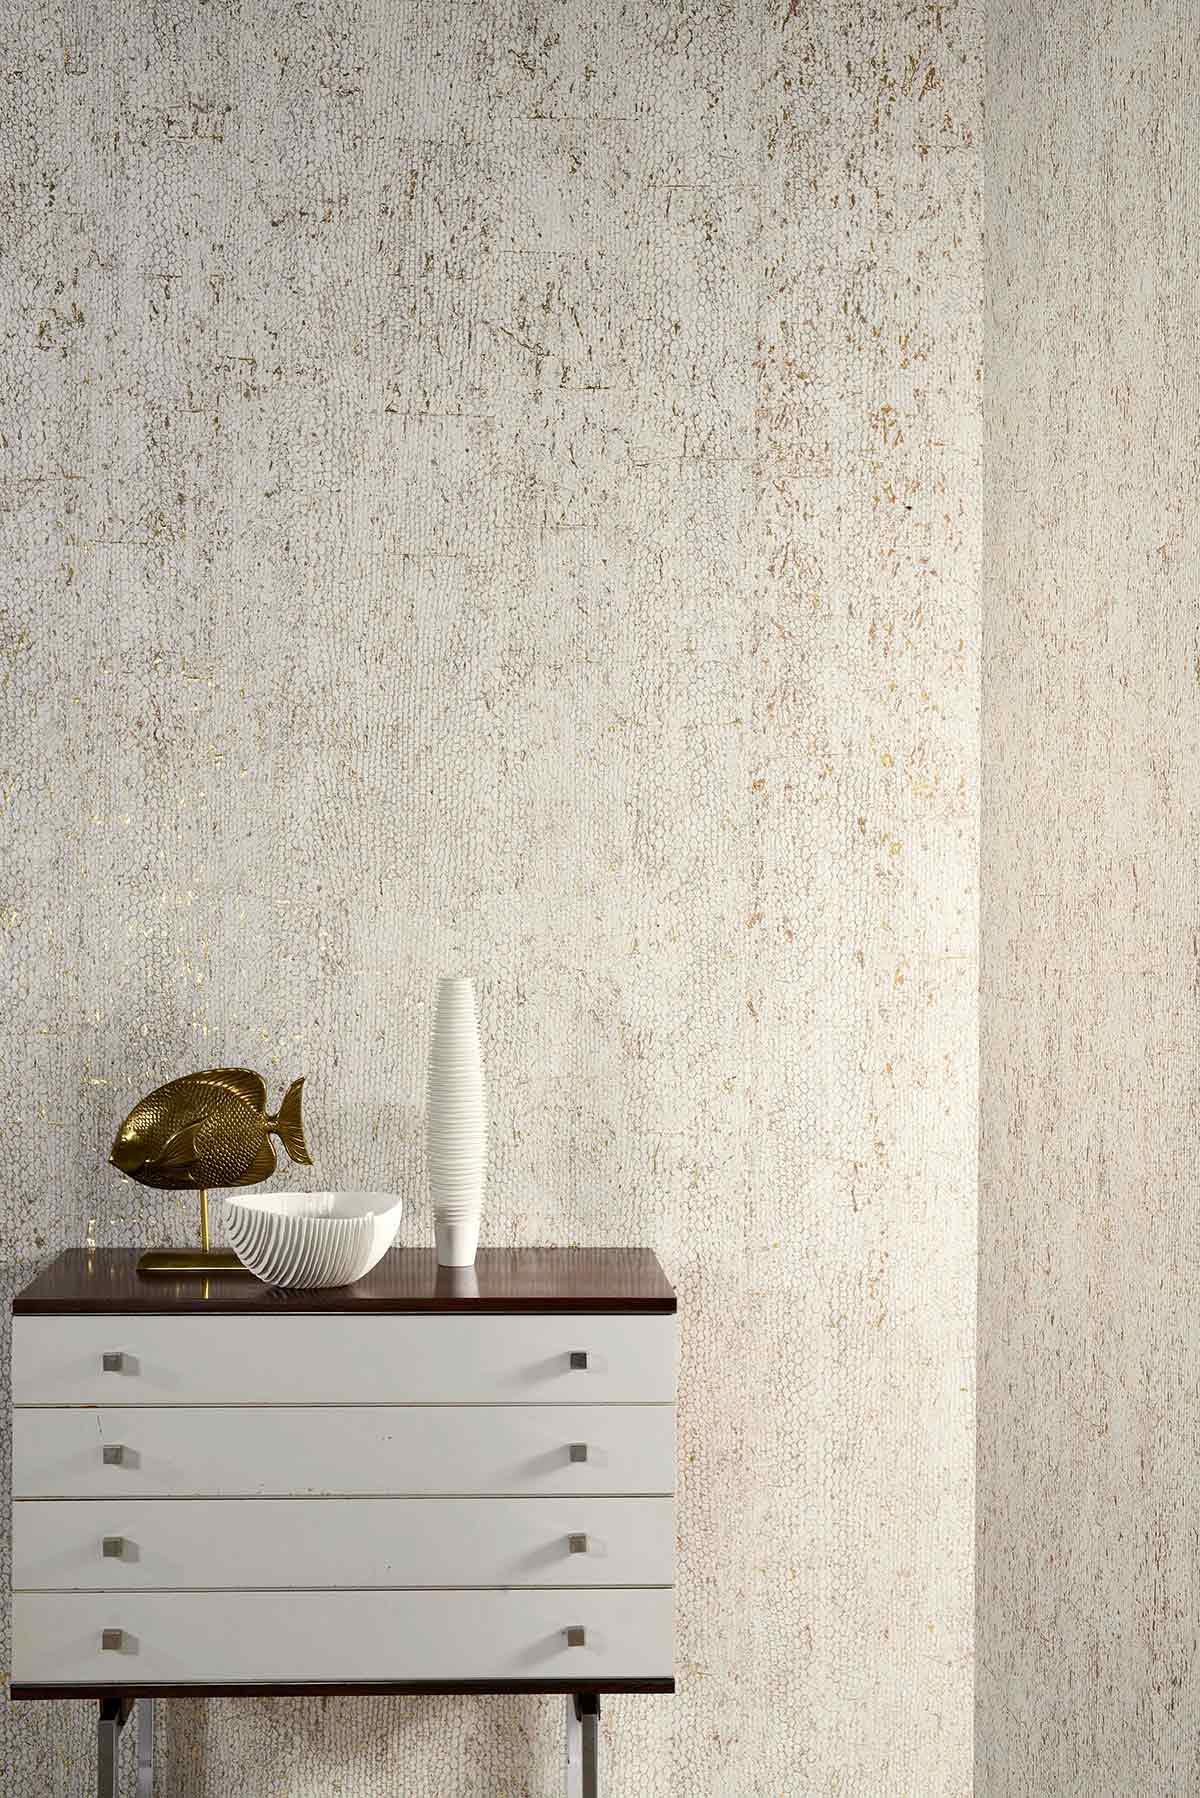 vliestapete online kaufen viele muster in unserem online shop. Black Bedroom Furniture Sets. Home Design Ideas